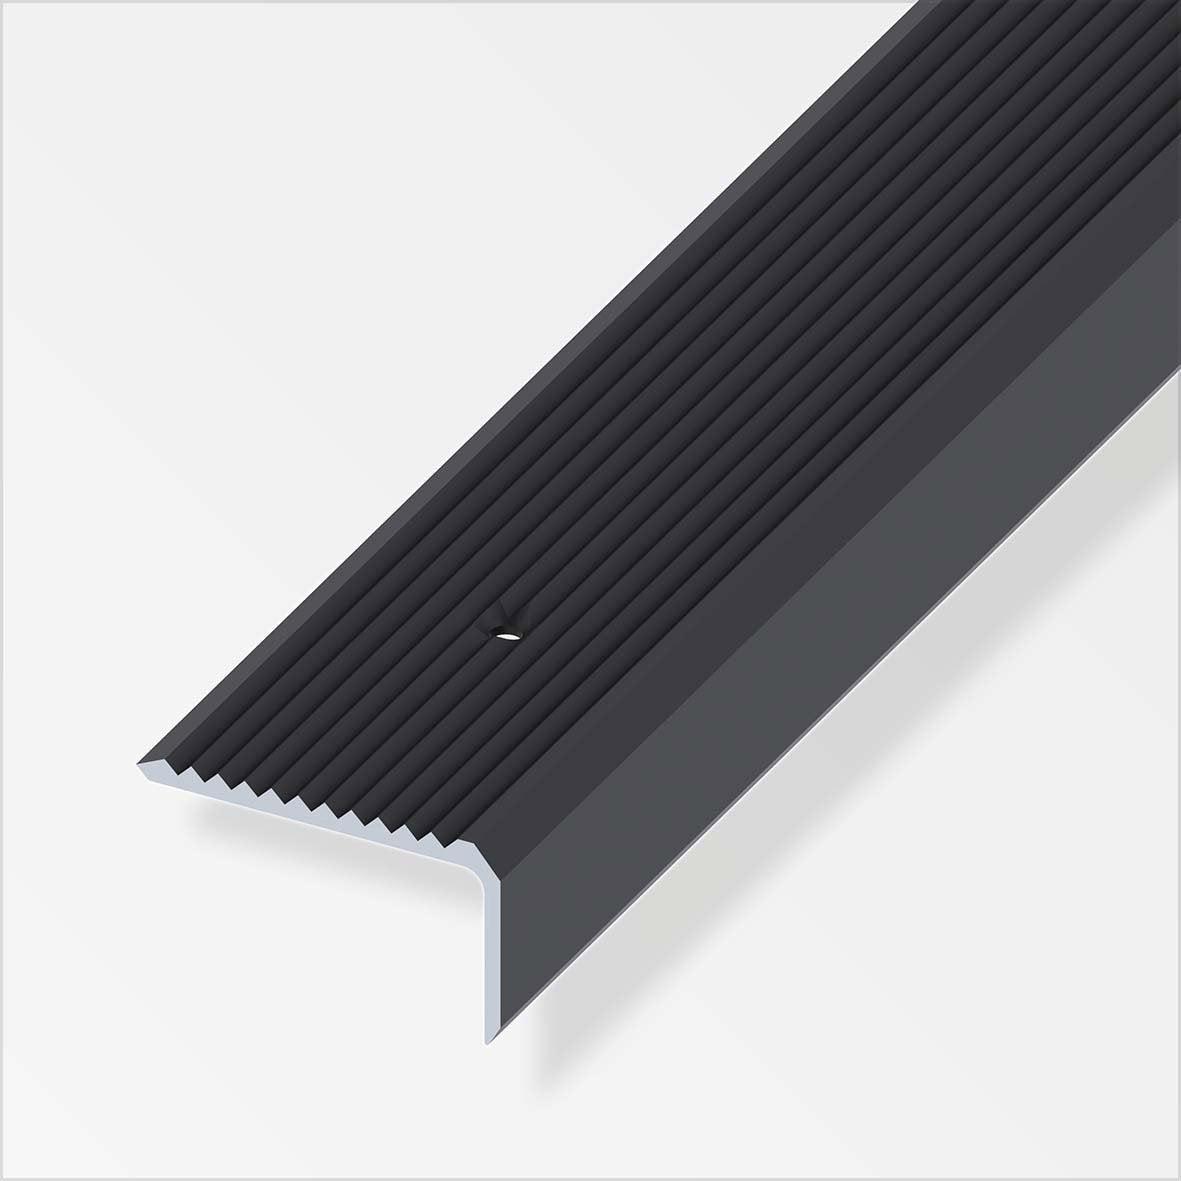 nez de marche aluminium anodis l 1 m x l 4 1 cm x h 2 3. Black Bedroom Furniture Sets. Home Design Ideas